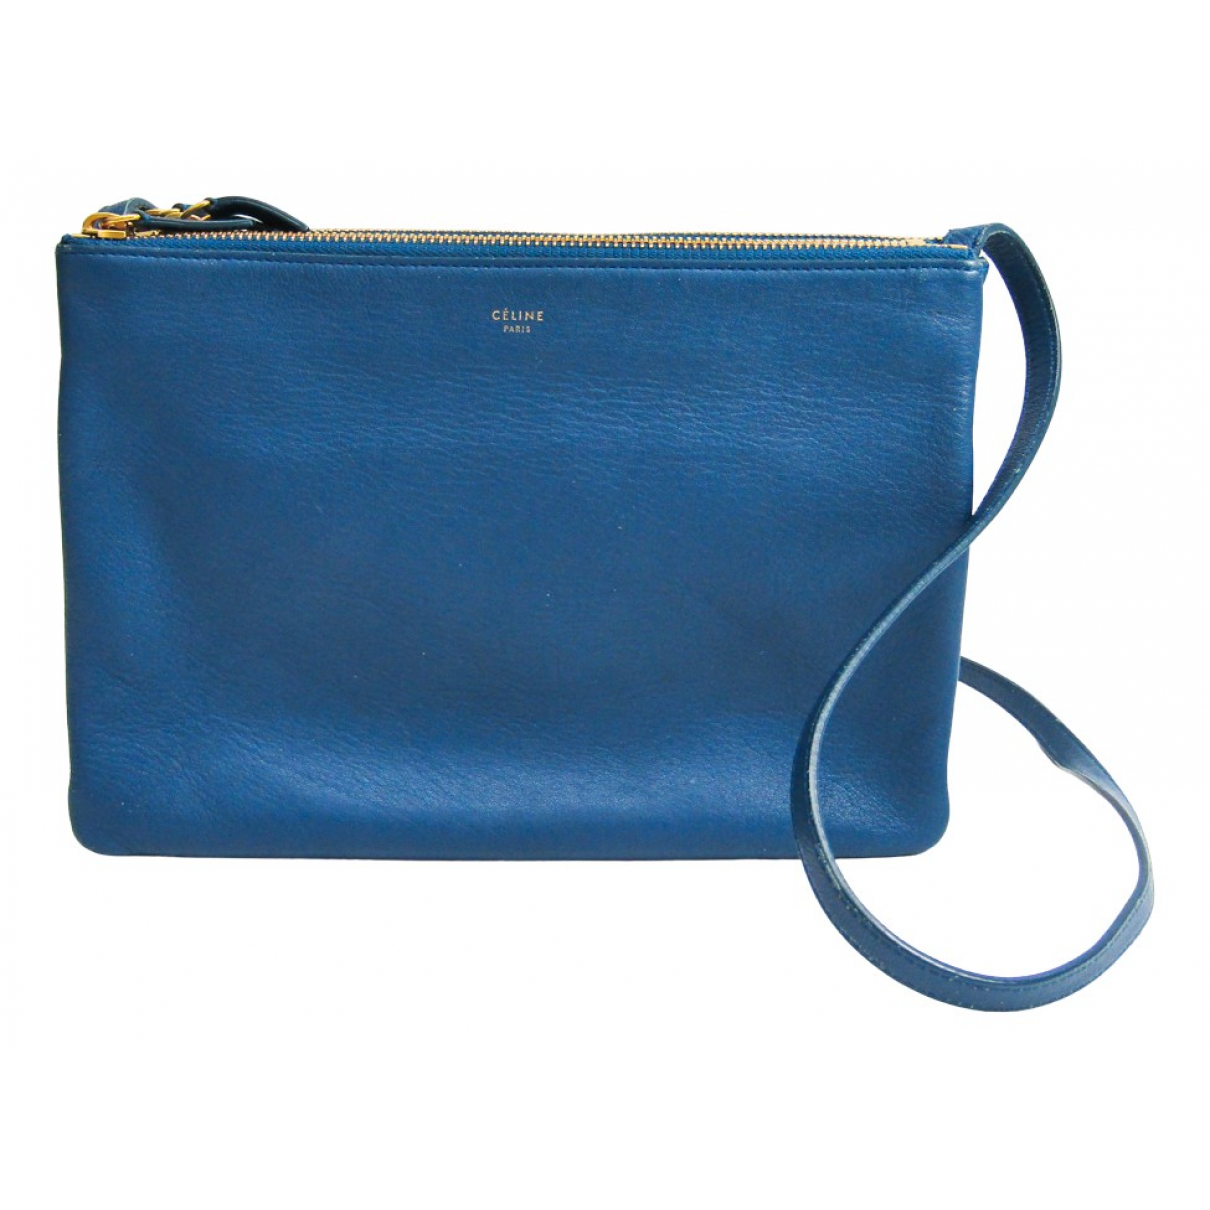 Celine Trio Handtasche in  Blau Leder